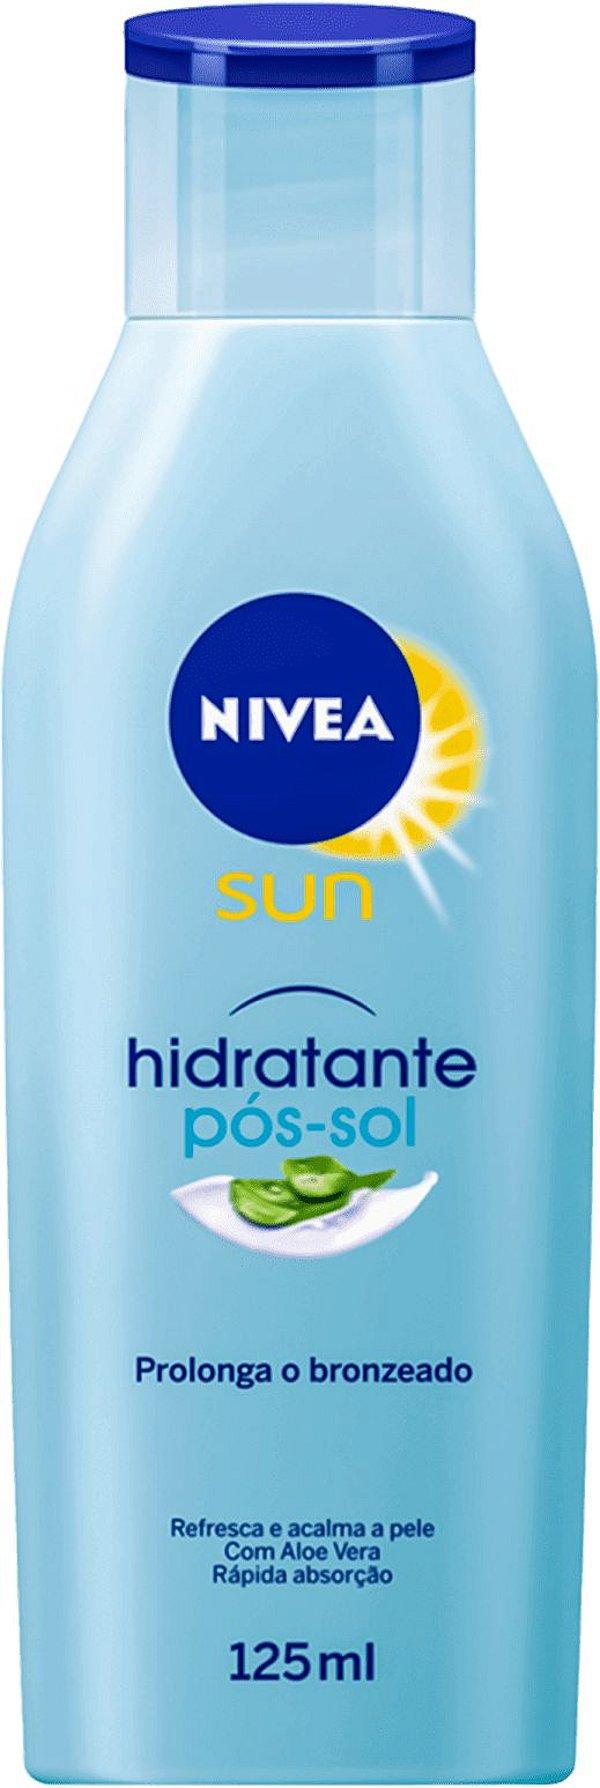 NIVEA SUN HIDRATANTE PÓS-SOL ALOE VERA 125mL